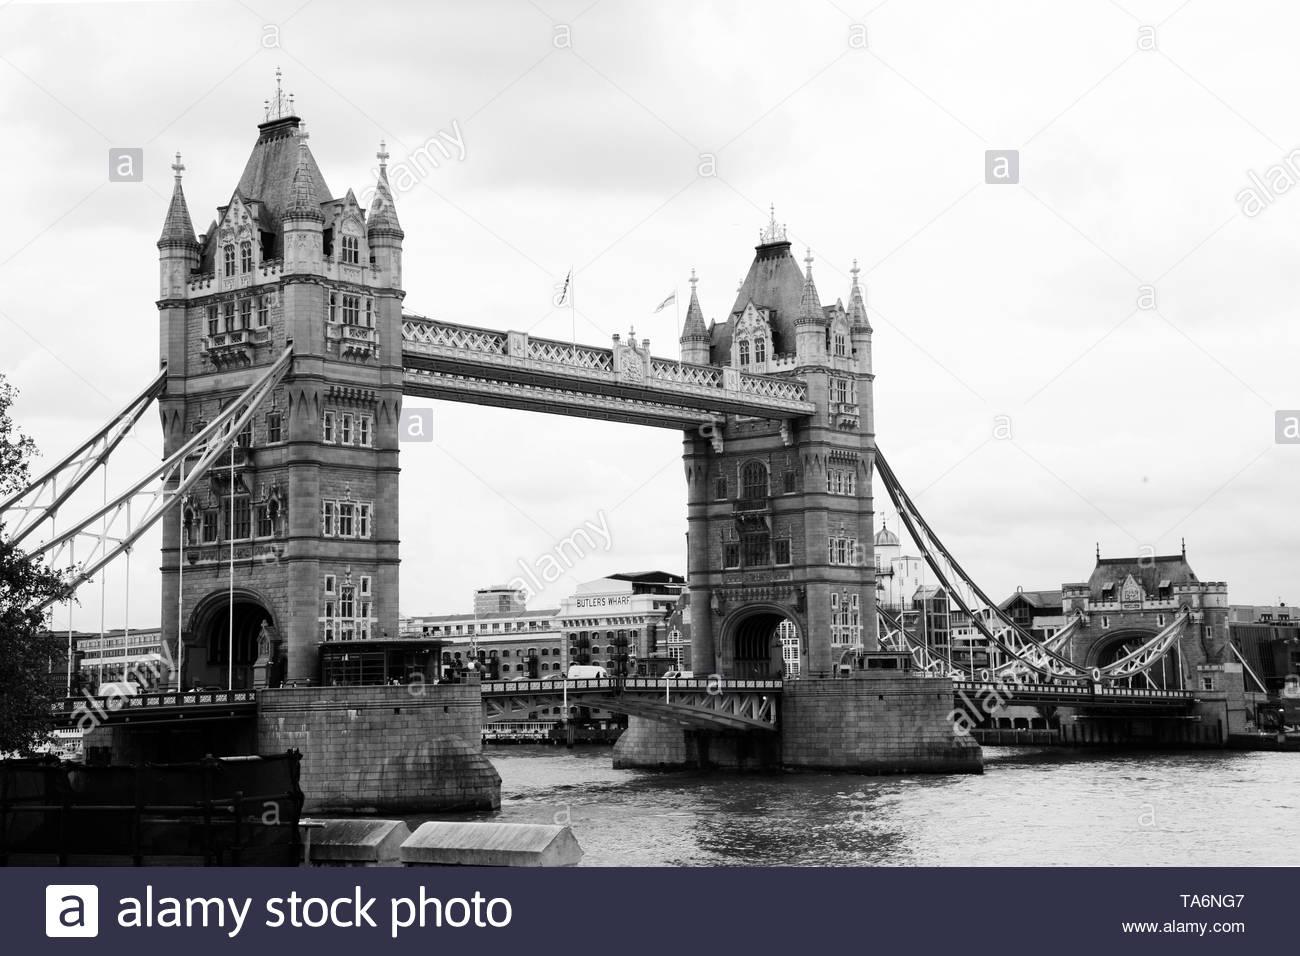 London Bridge Stock Photo